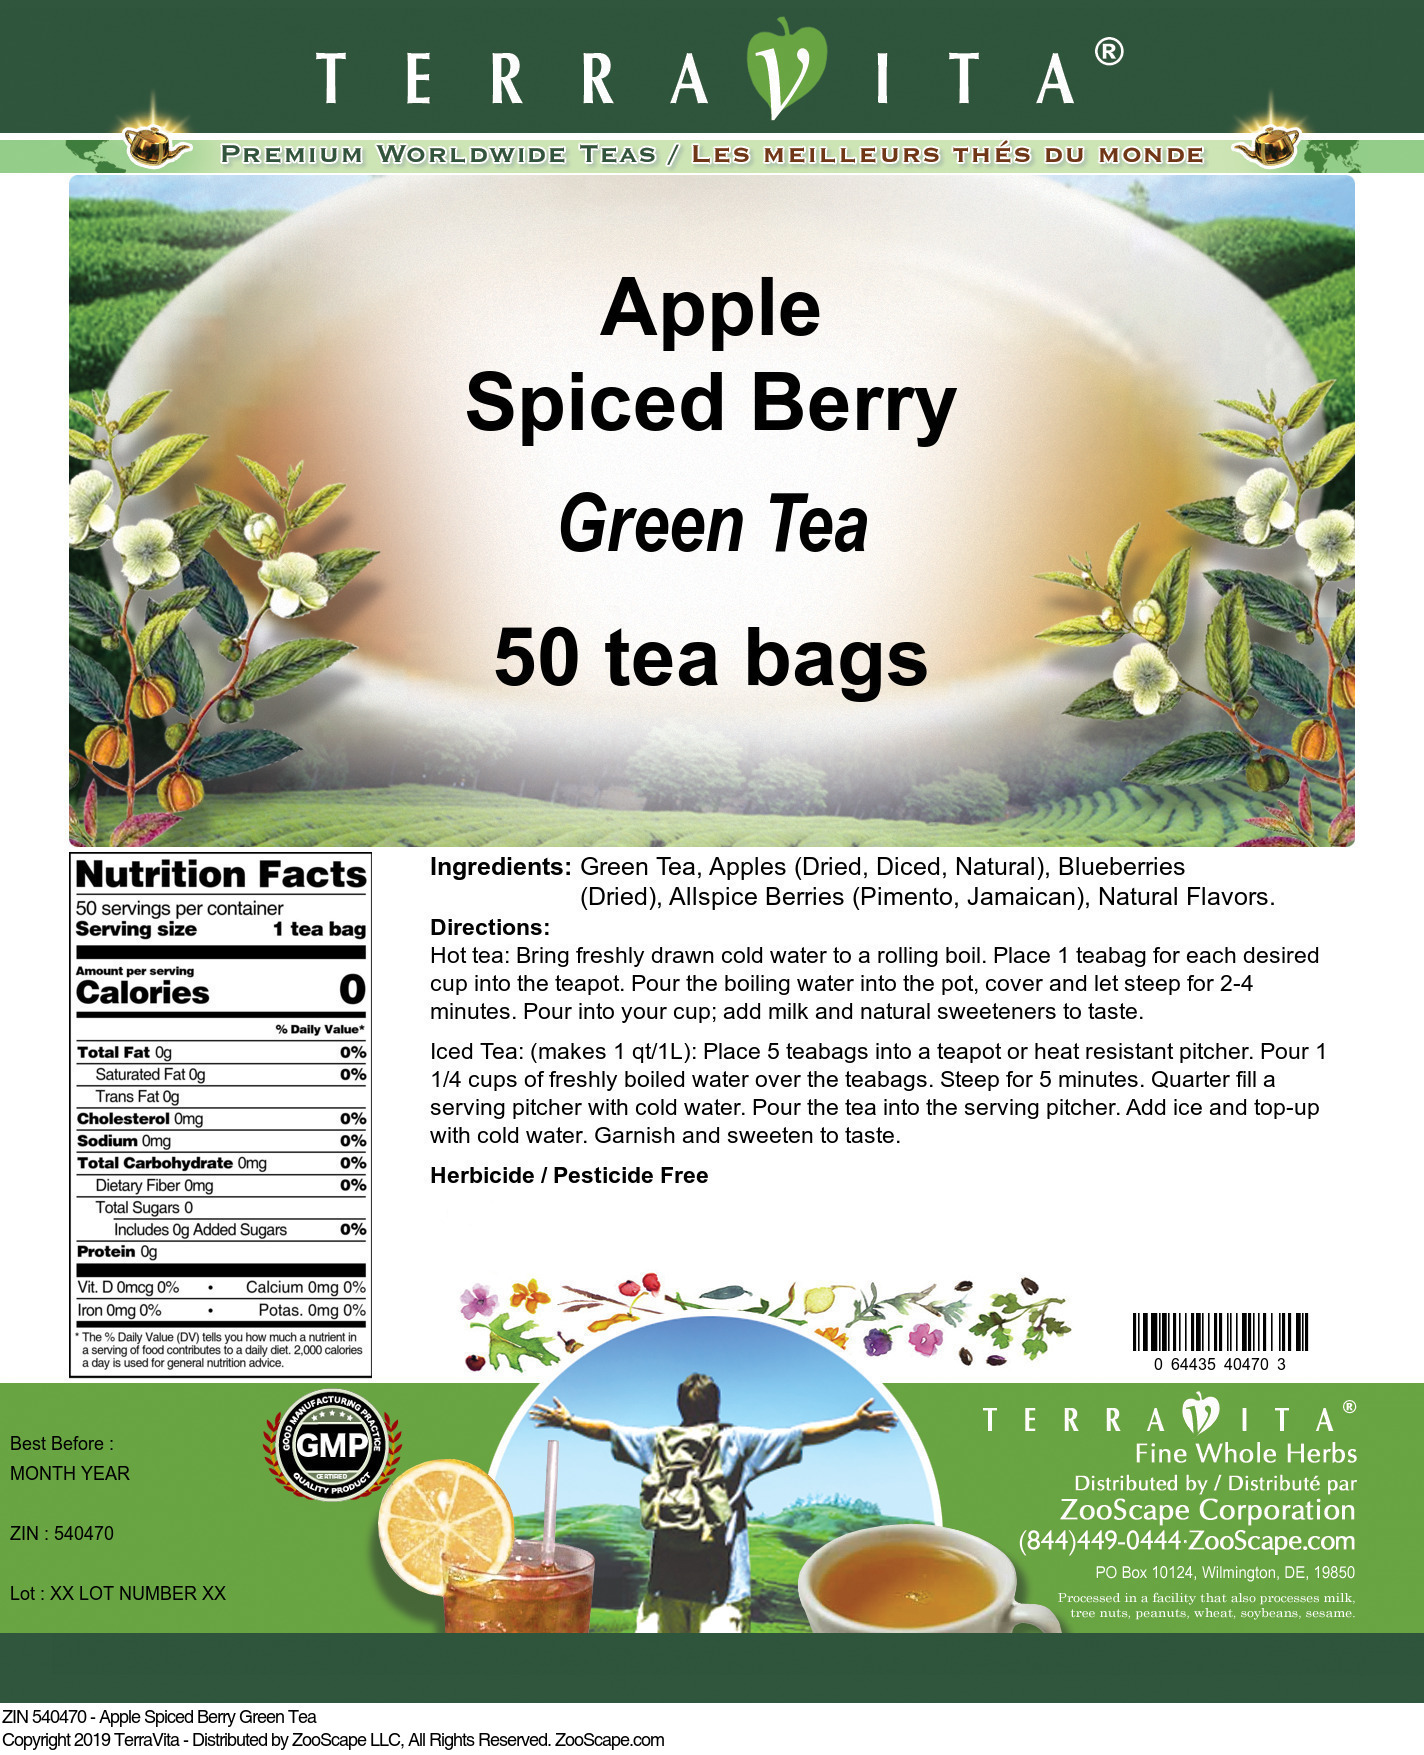 Apple Spiced Berry Green Tea